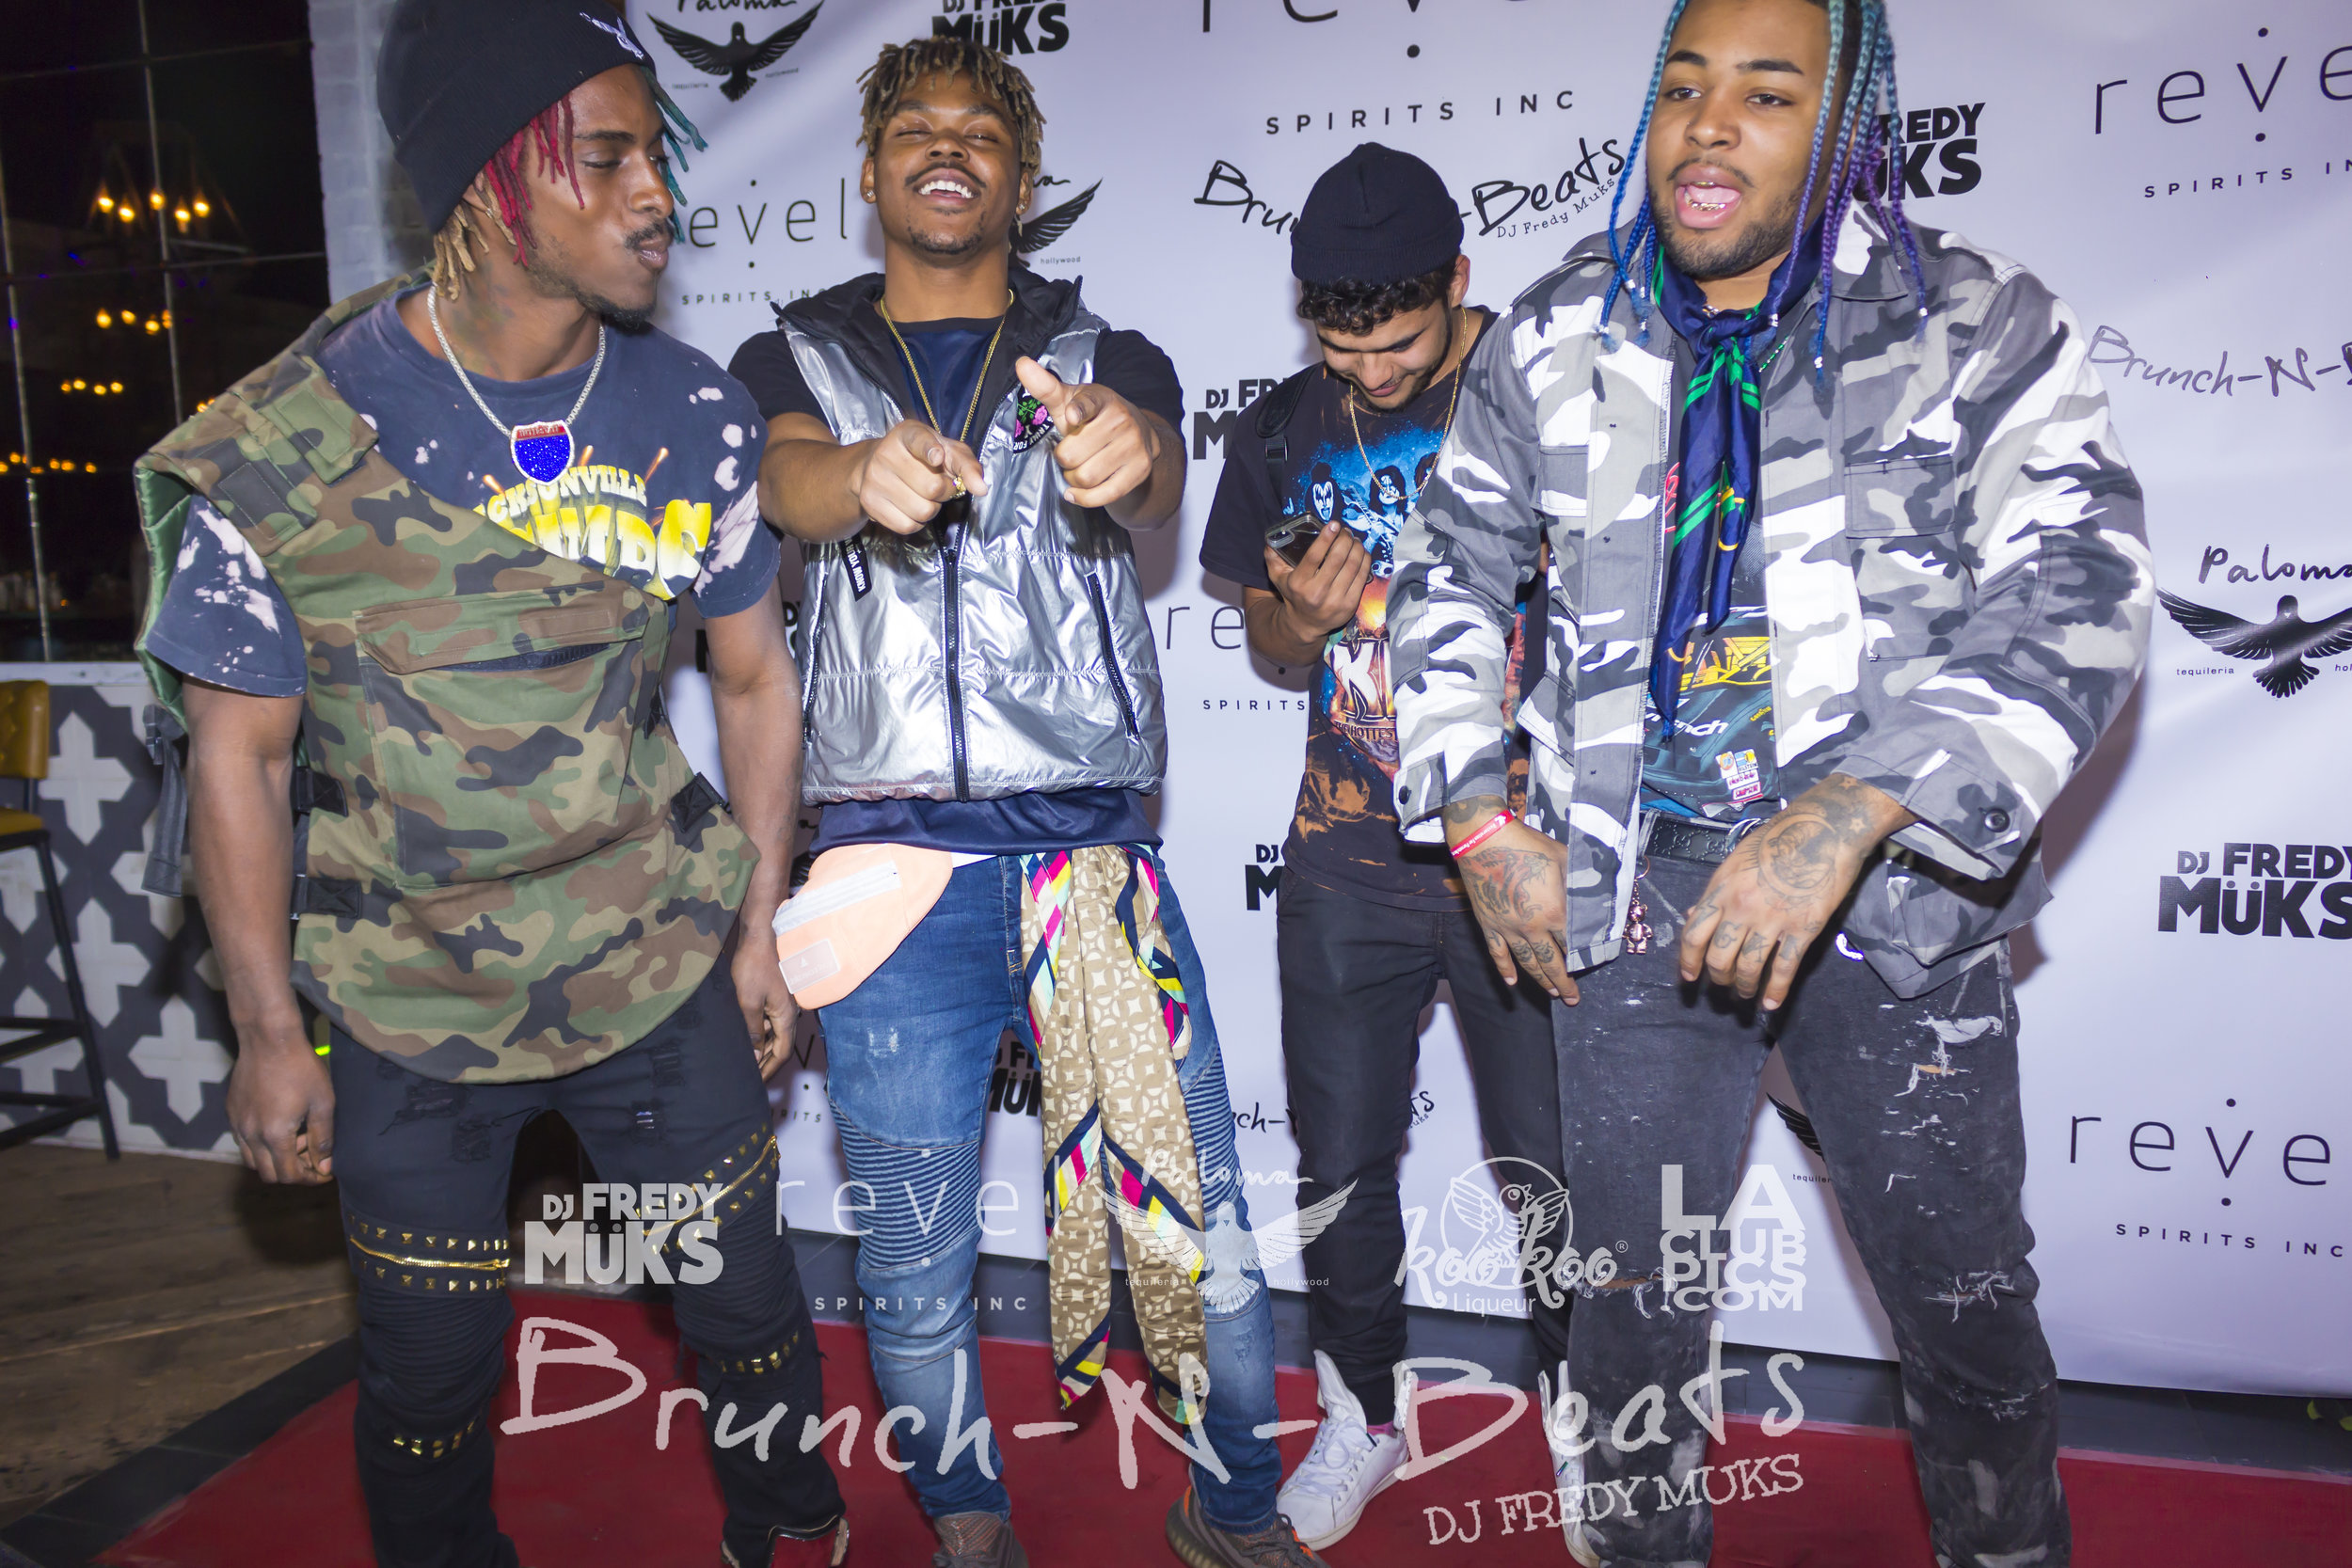 Brunch-N-Beats - Paloma Hollywood - 02-25-18_221.jpg